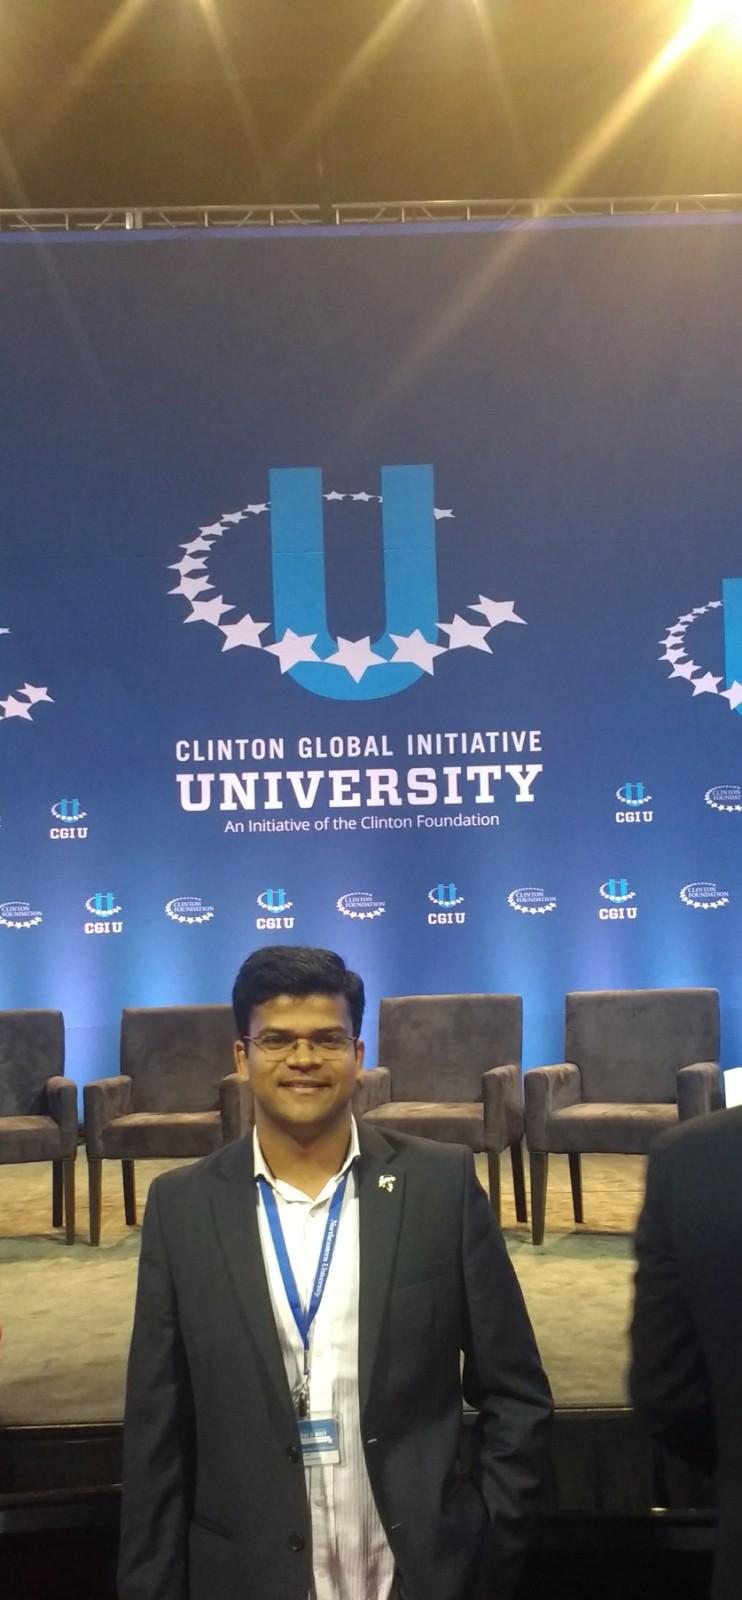 Abhishek Jindal in front of a Clinton Global Initiative University backdrop